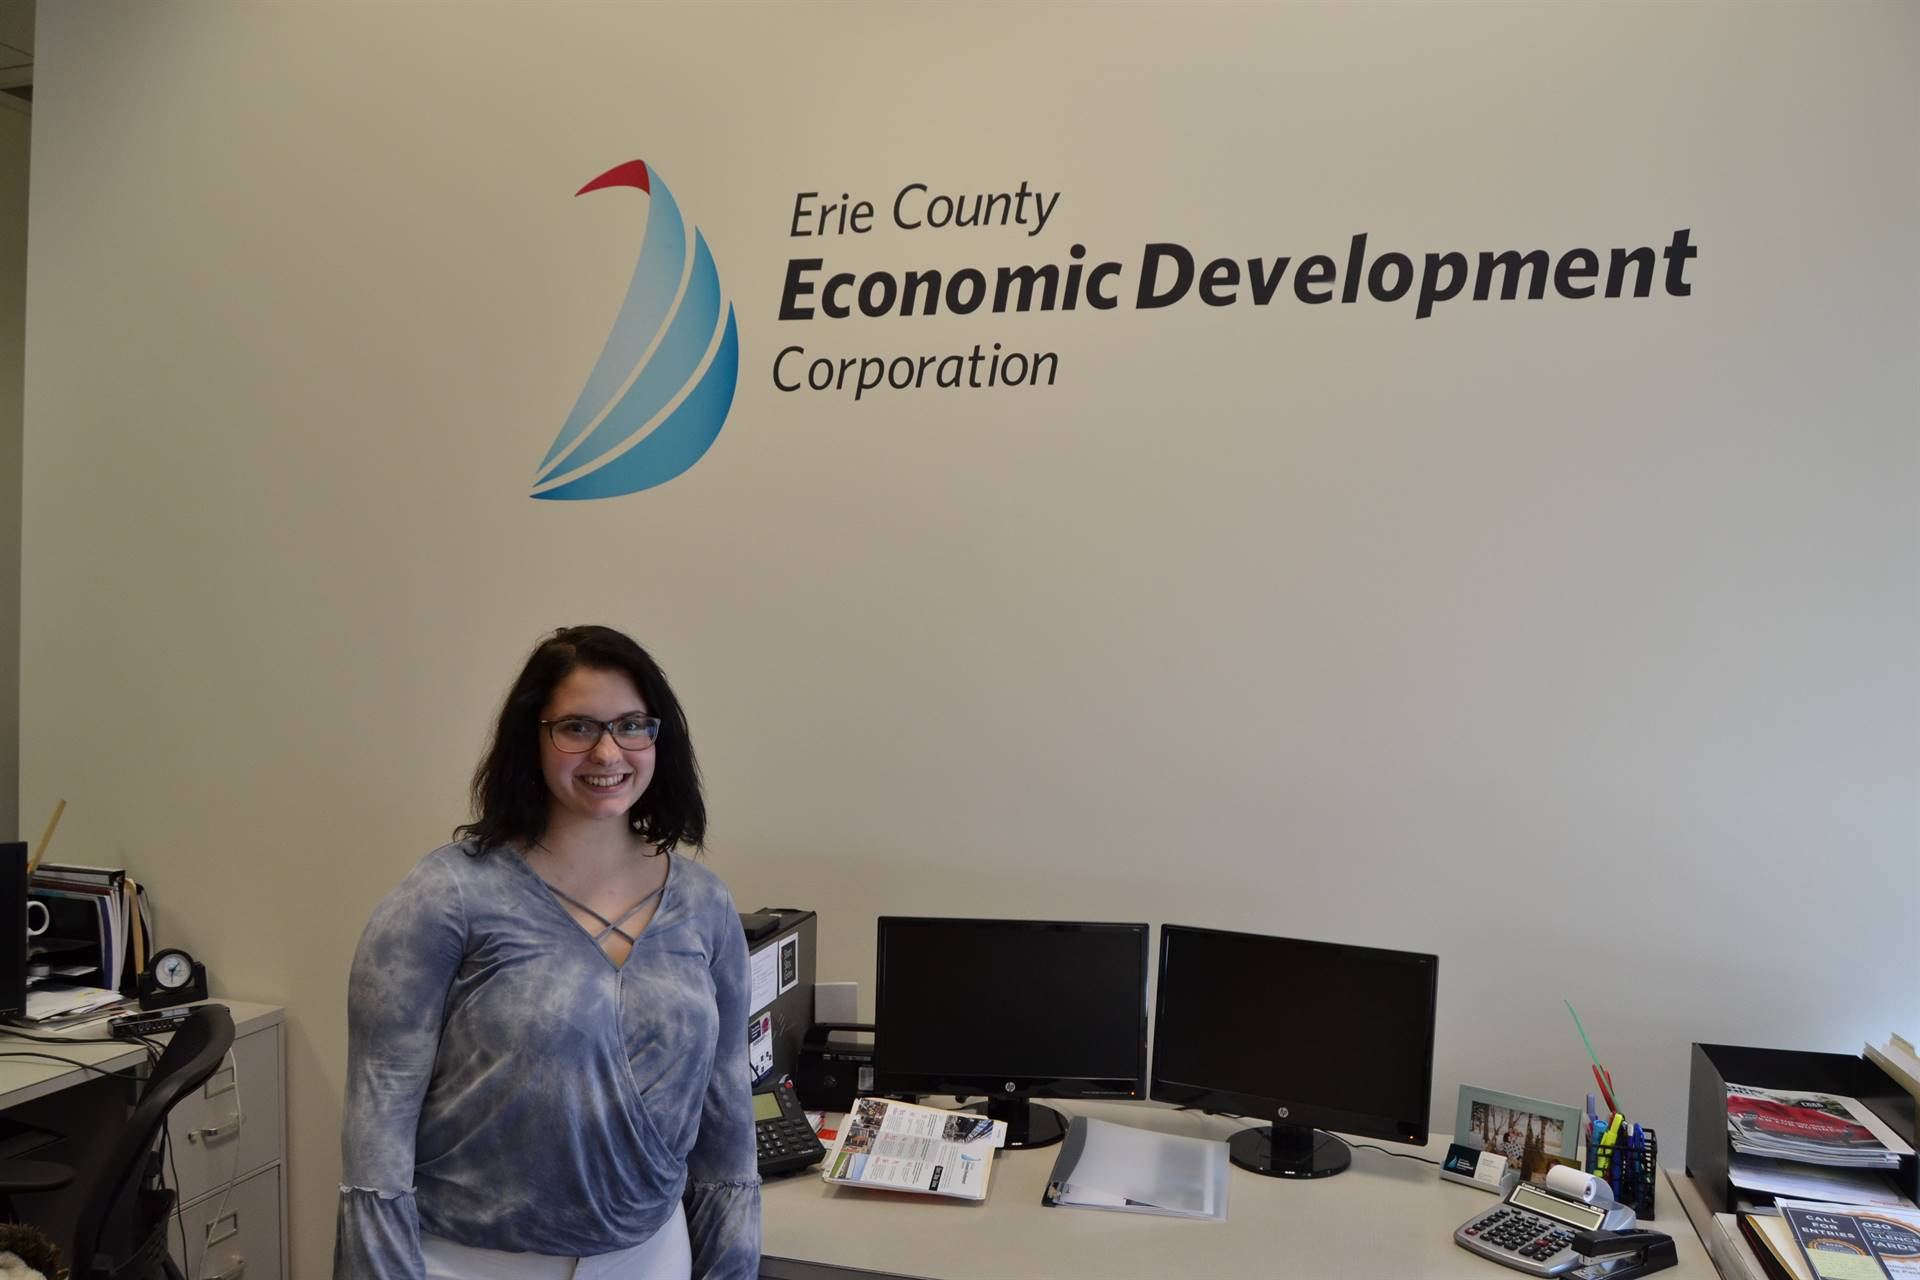 Erie County Economic Development Internship